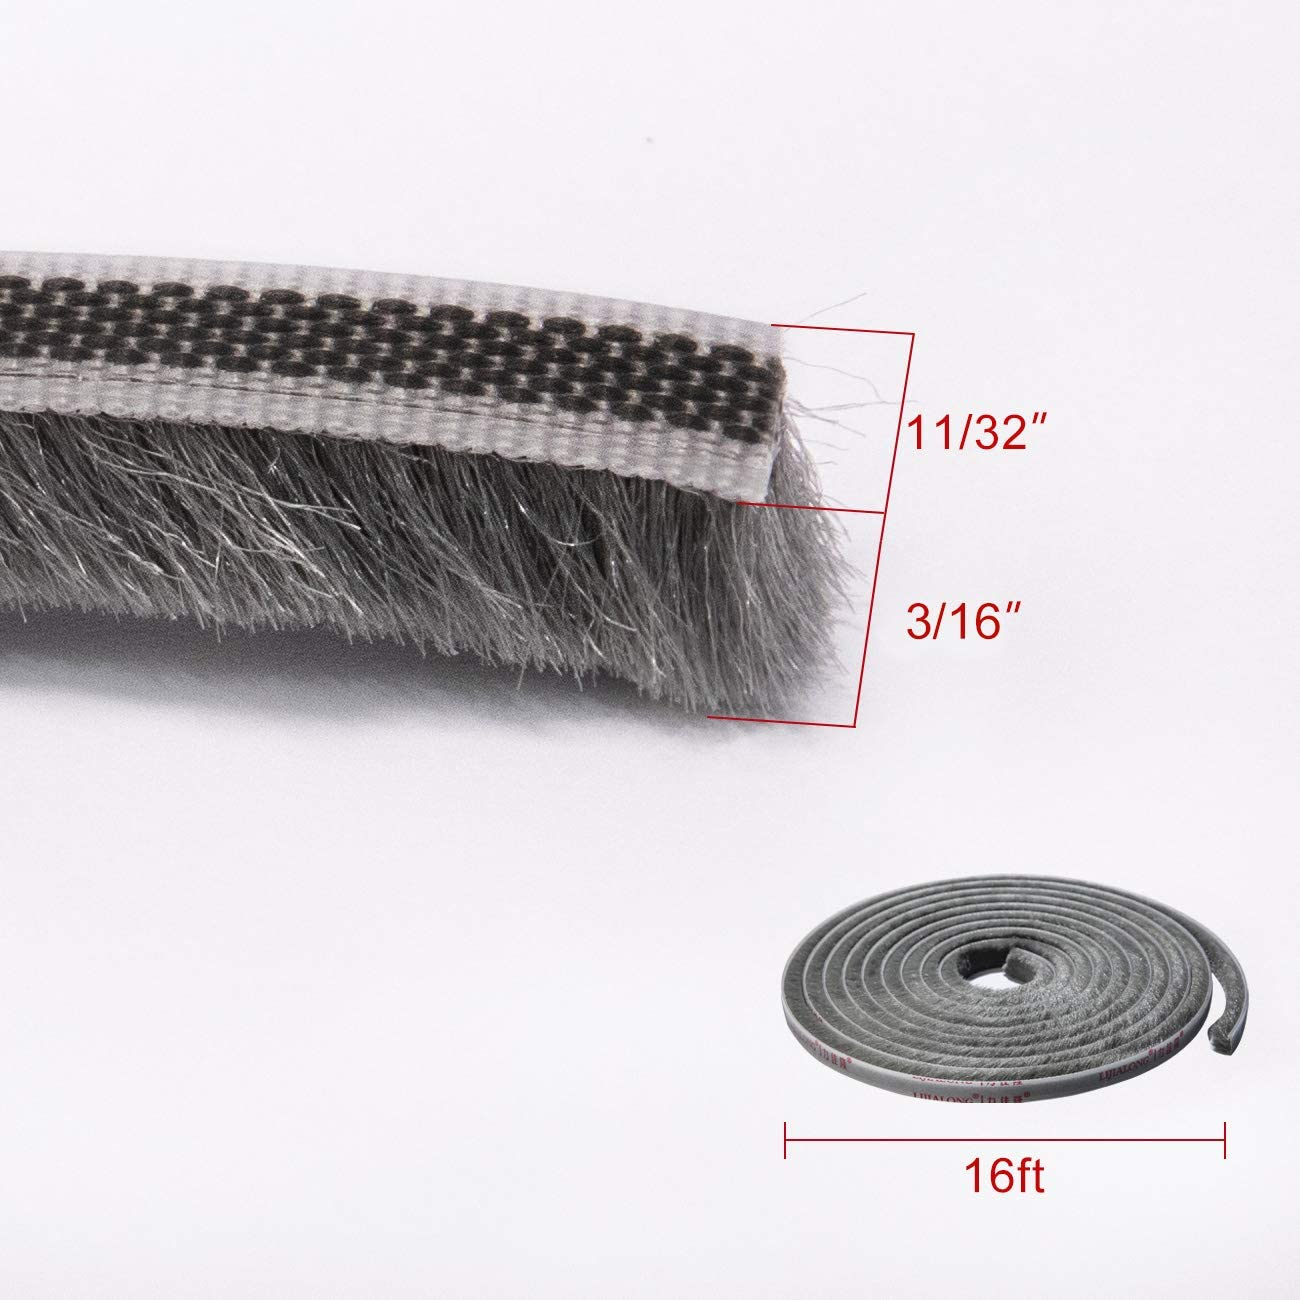 Black High Density Felt Door Brush Strip for Sliding Sash Door Window Wardrobe Seal fowong Adhesive Brush Weather Stripping 11//32 inch x 3//16 inch x 16 Feet